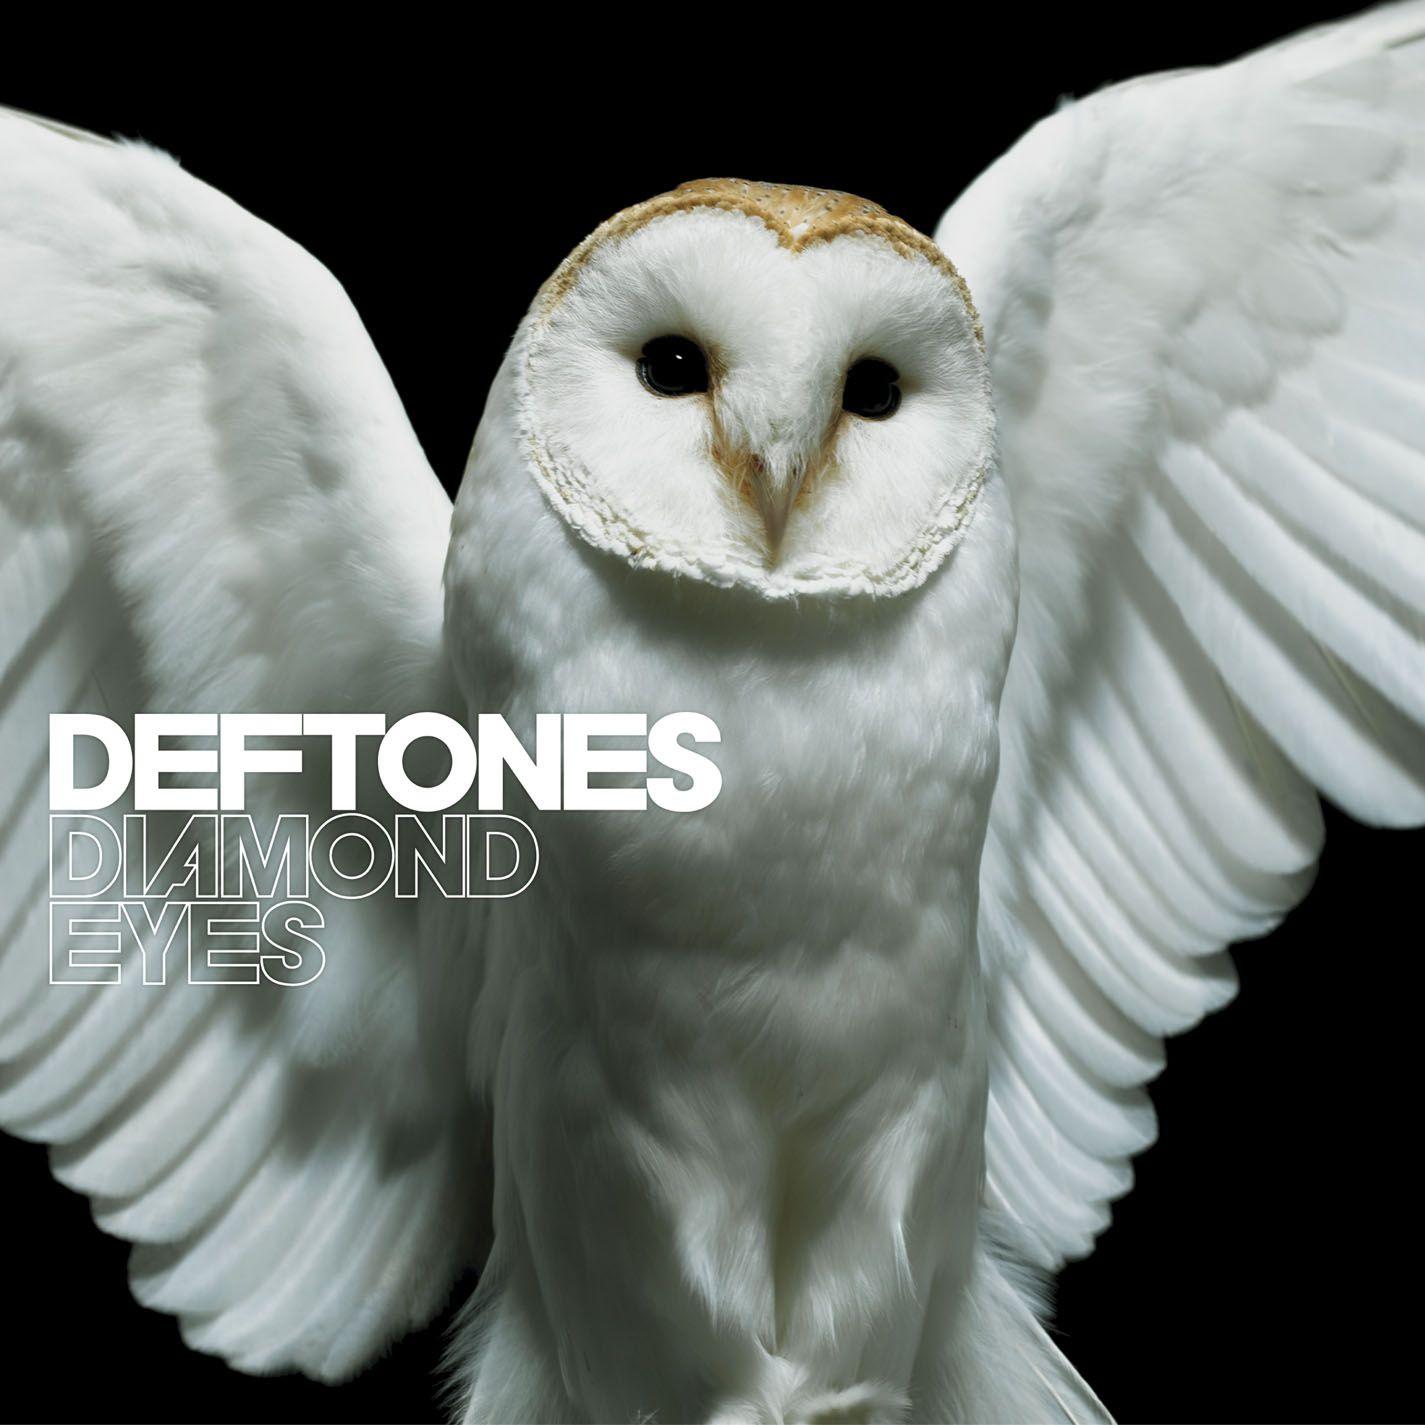 deftones diamond